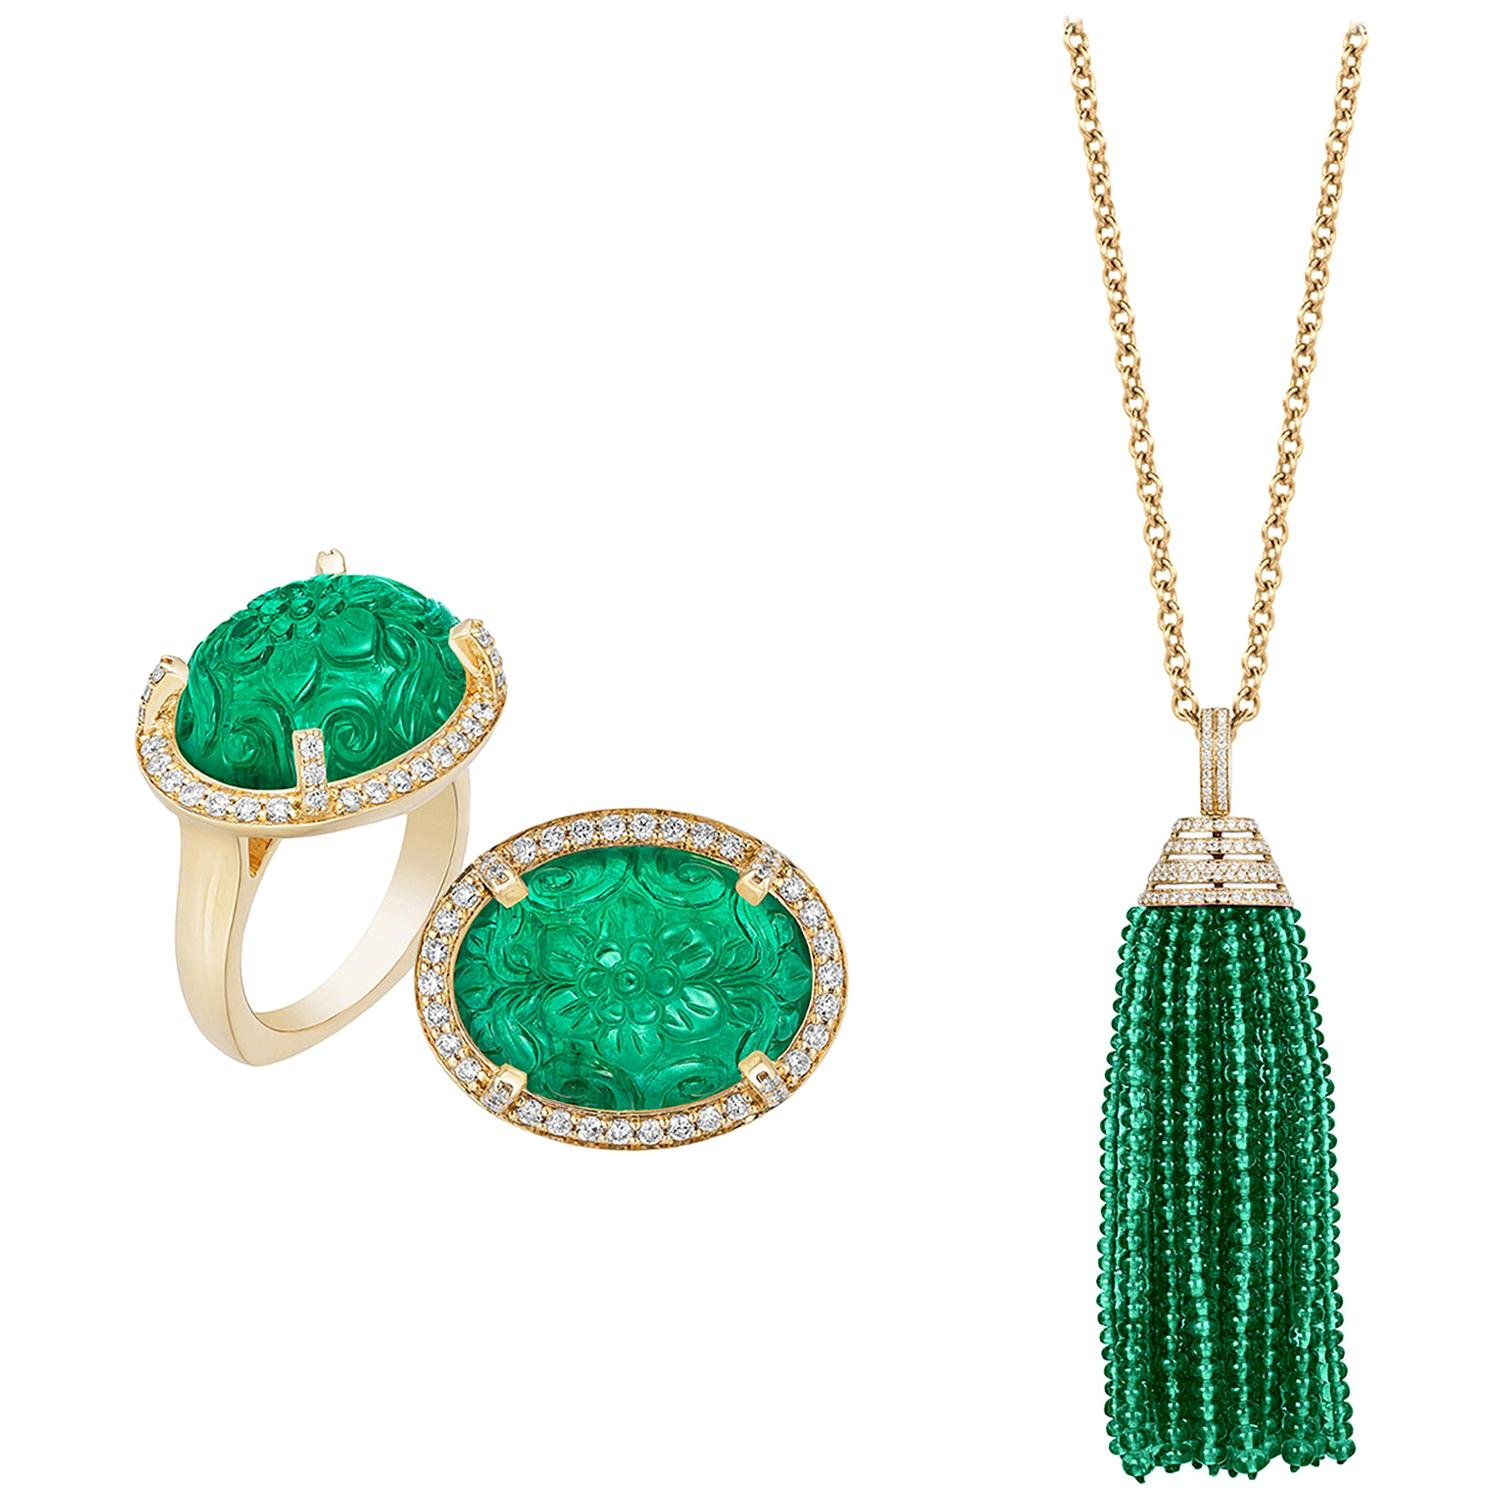 Goshwara Emerald Tumble Tassel Pendant and Carved Emerald Diamond Ring